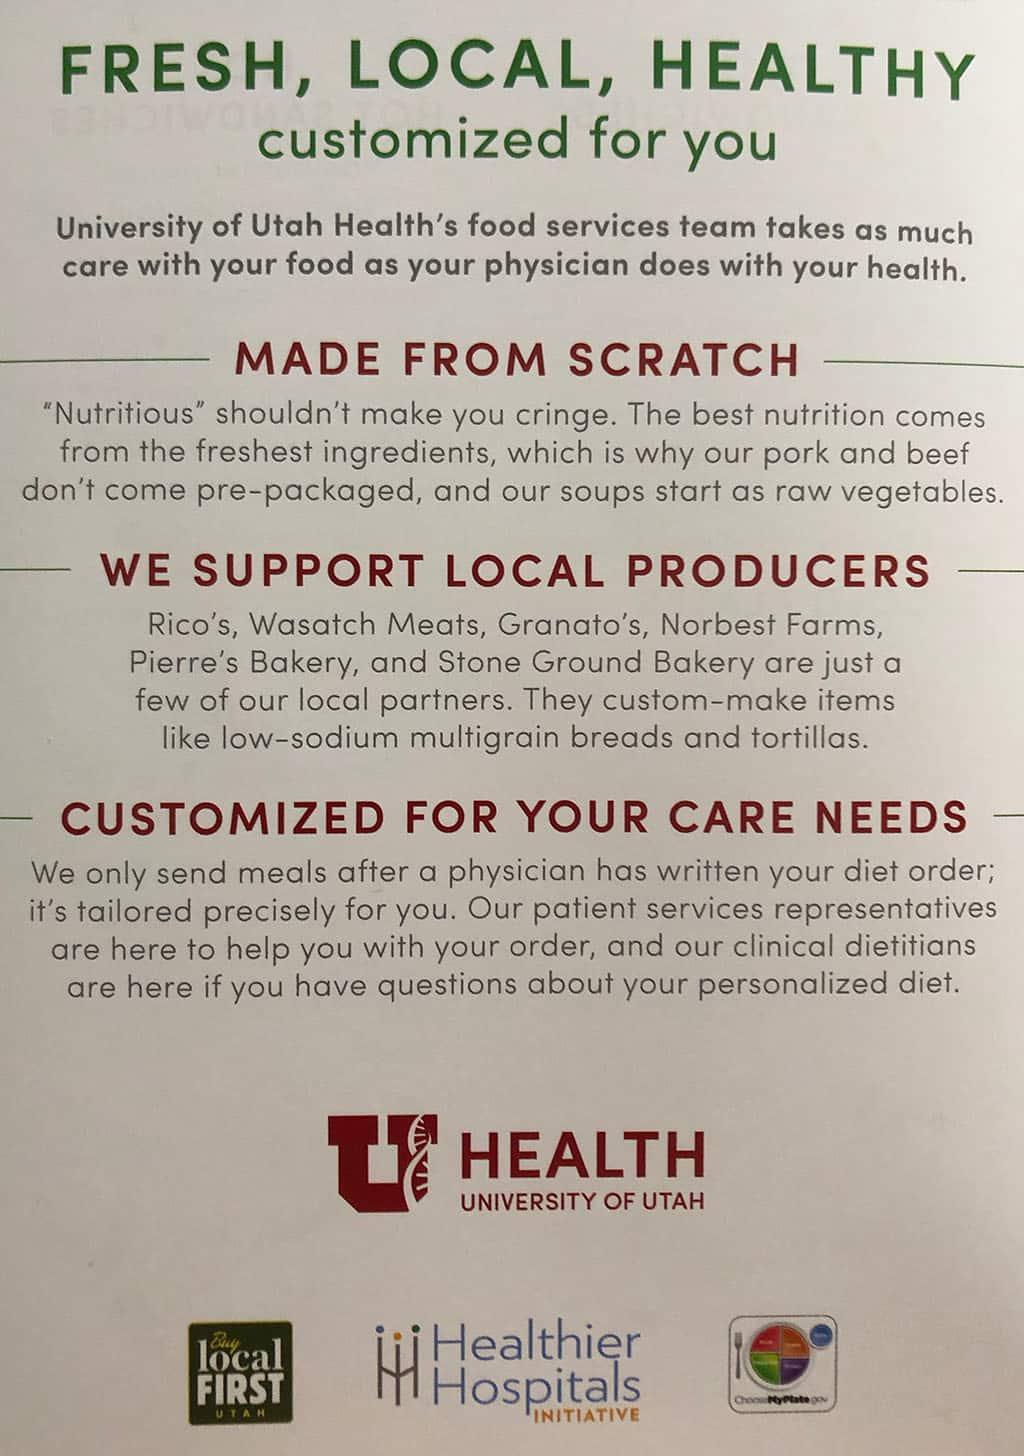 University Of Utah Hospital In Patient menu - details